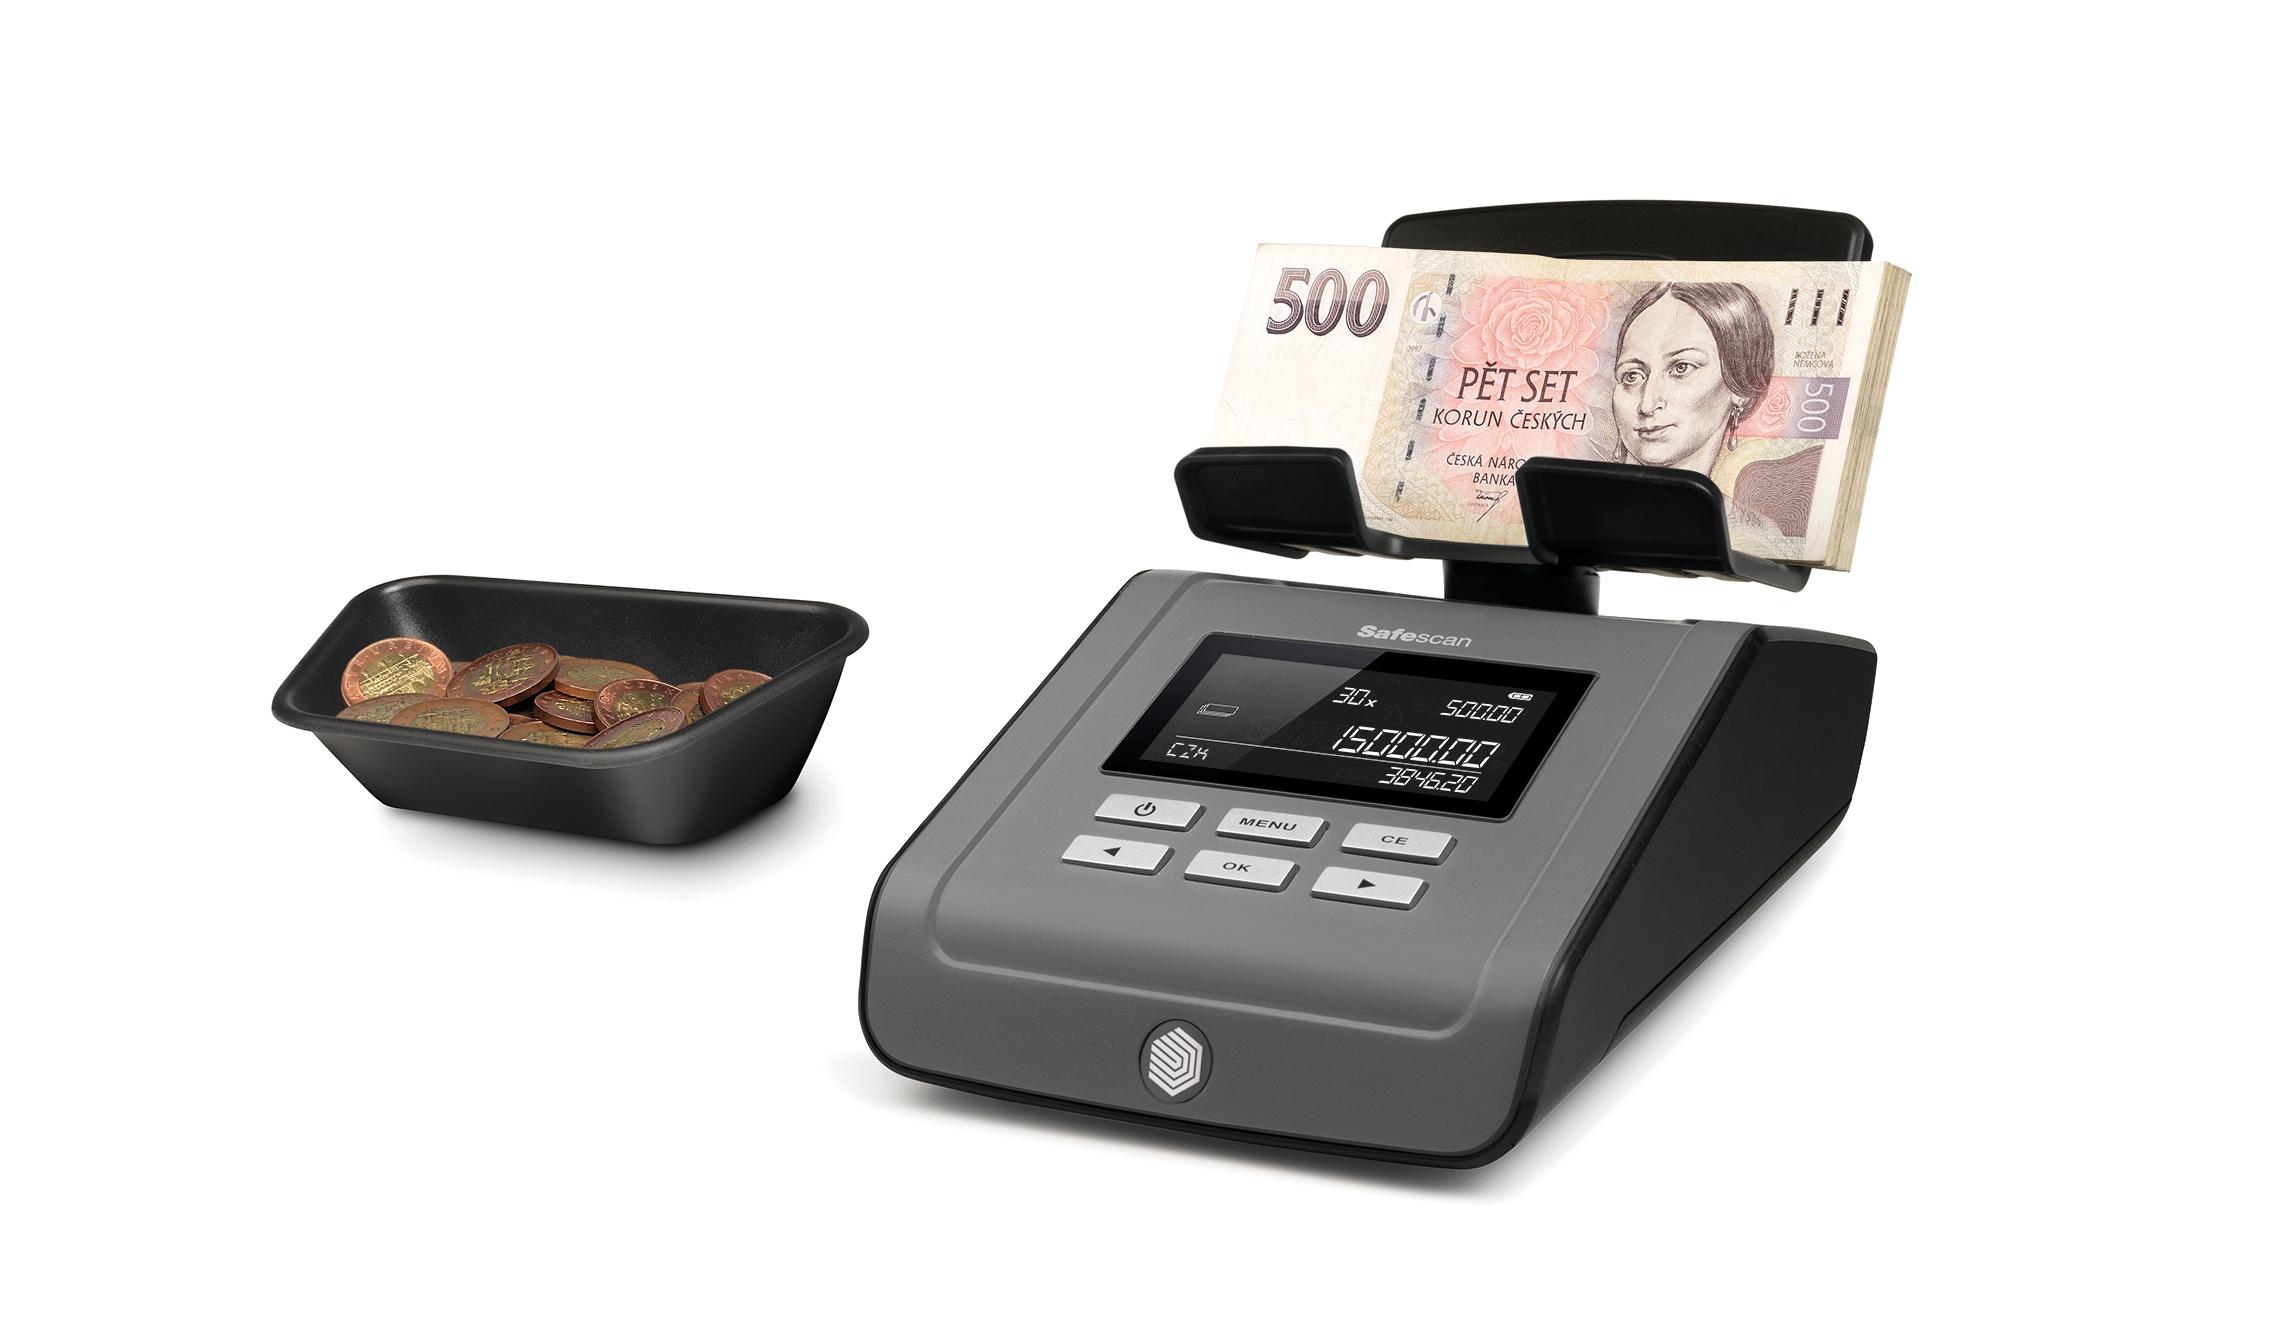 pocitacka-minci-a-bankovek-safescan-6165